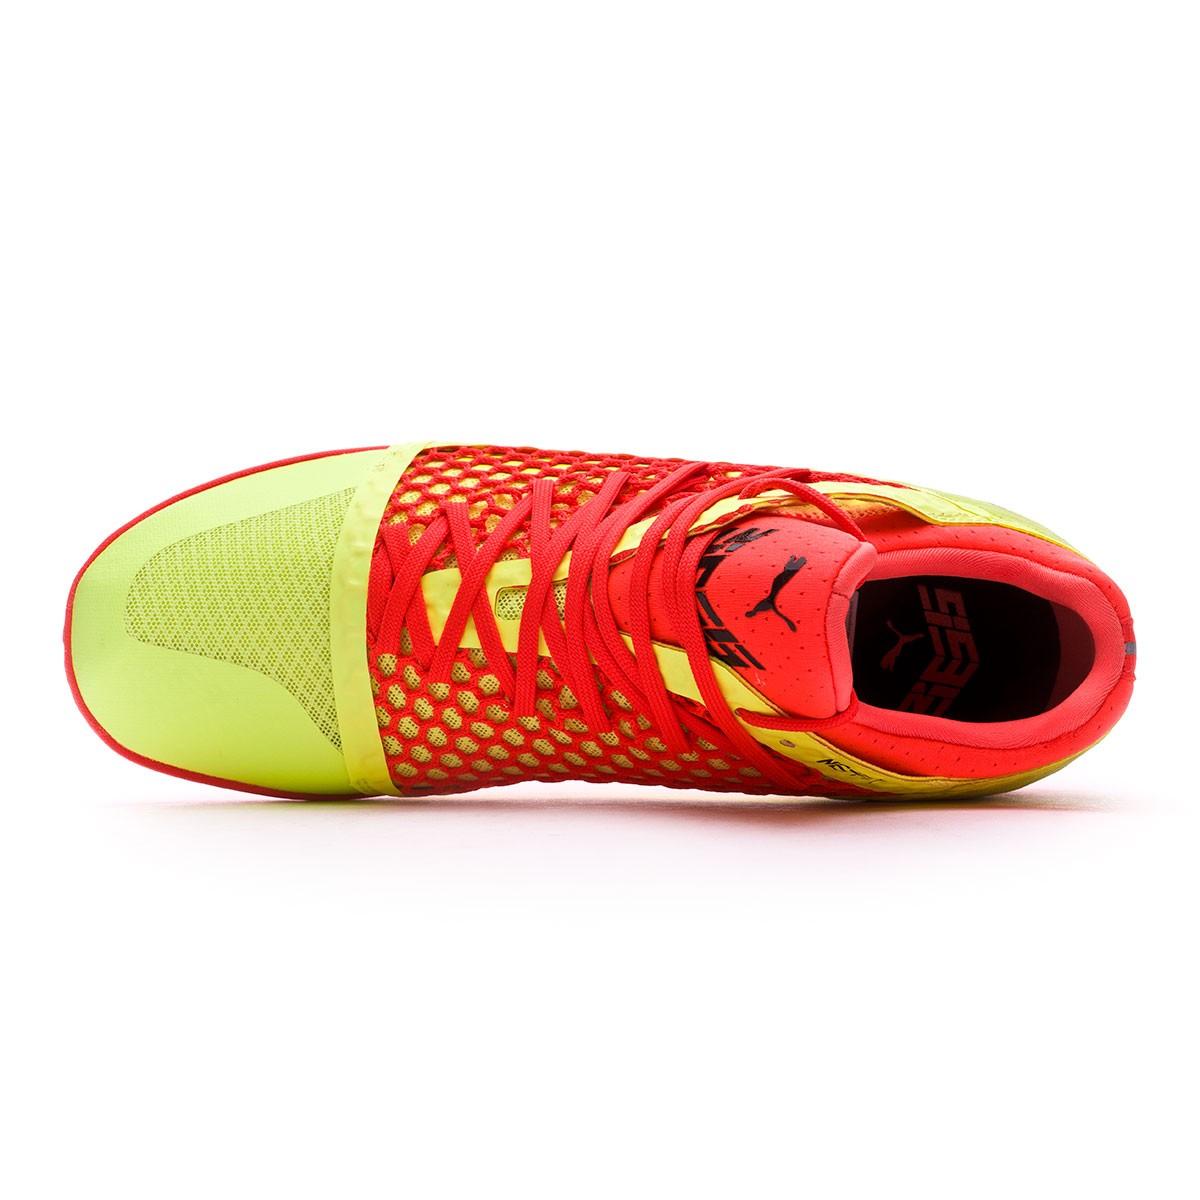 online retailer 5dec2 3e611 Sapatilha de Futsal Puma 365 Netfit CT Fizzy Yellow-Red Blast-Puma Black -  Loja de futebol Fútbol Emotion